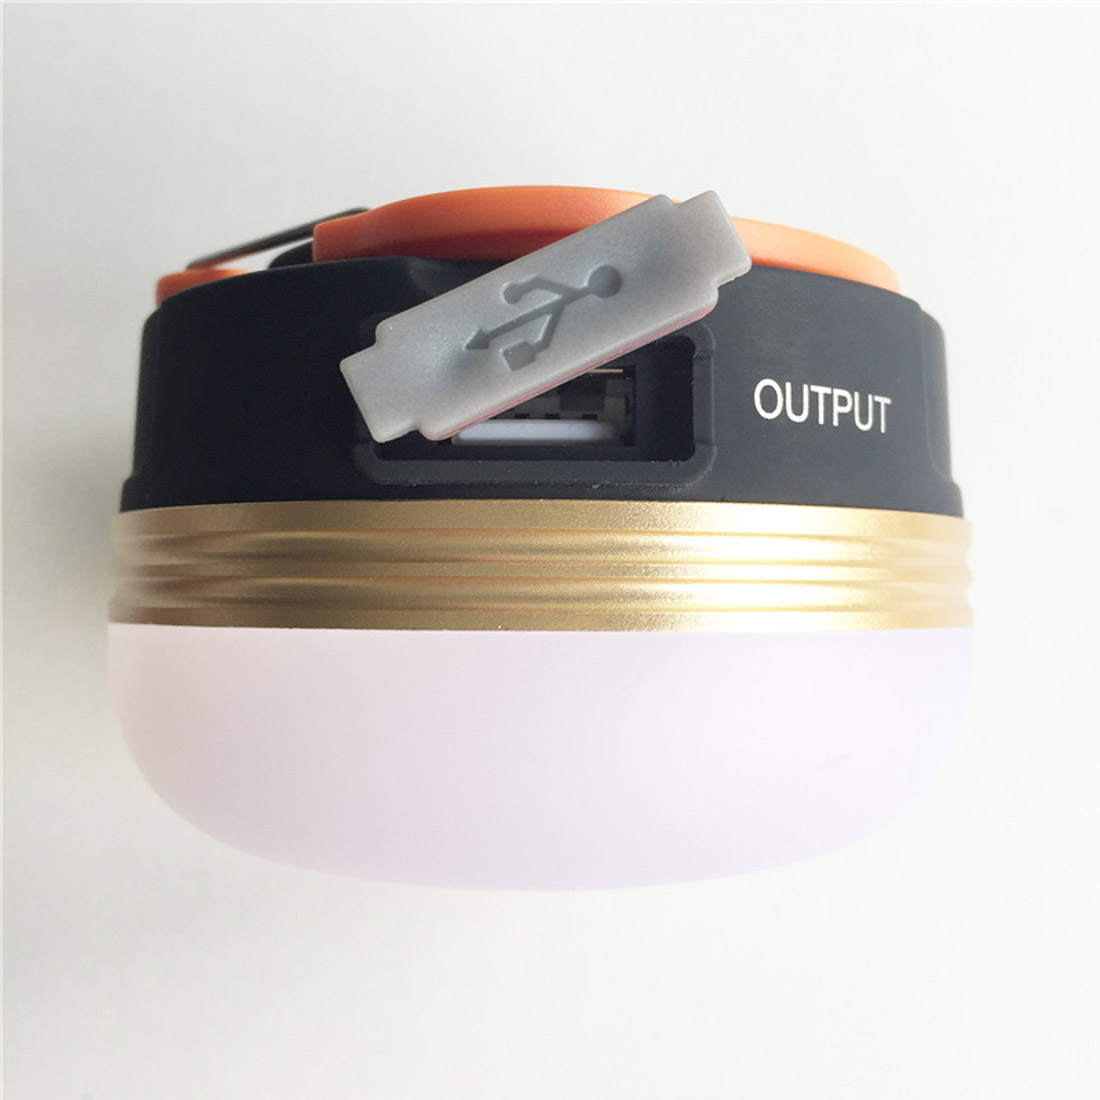 Multifunction USB Camping Lights LED Flashlight Outdoor Portable Lantern Mini Tent Light Emergency Lamp Pocket Torch